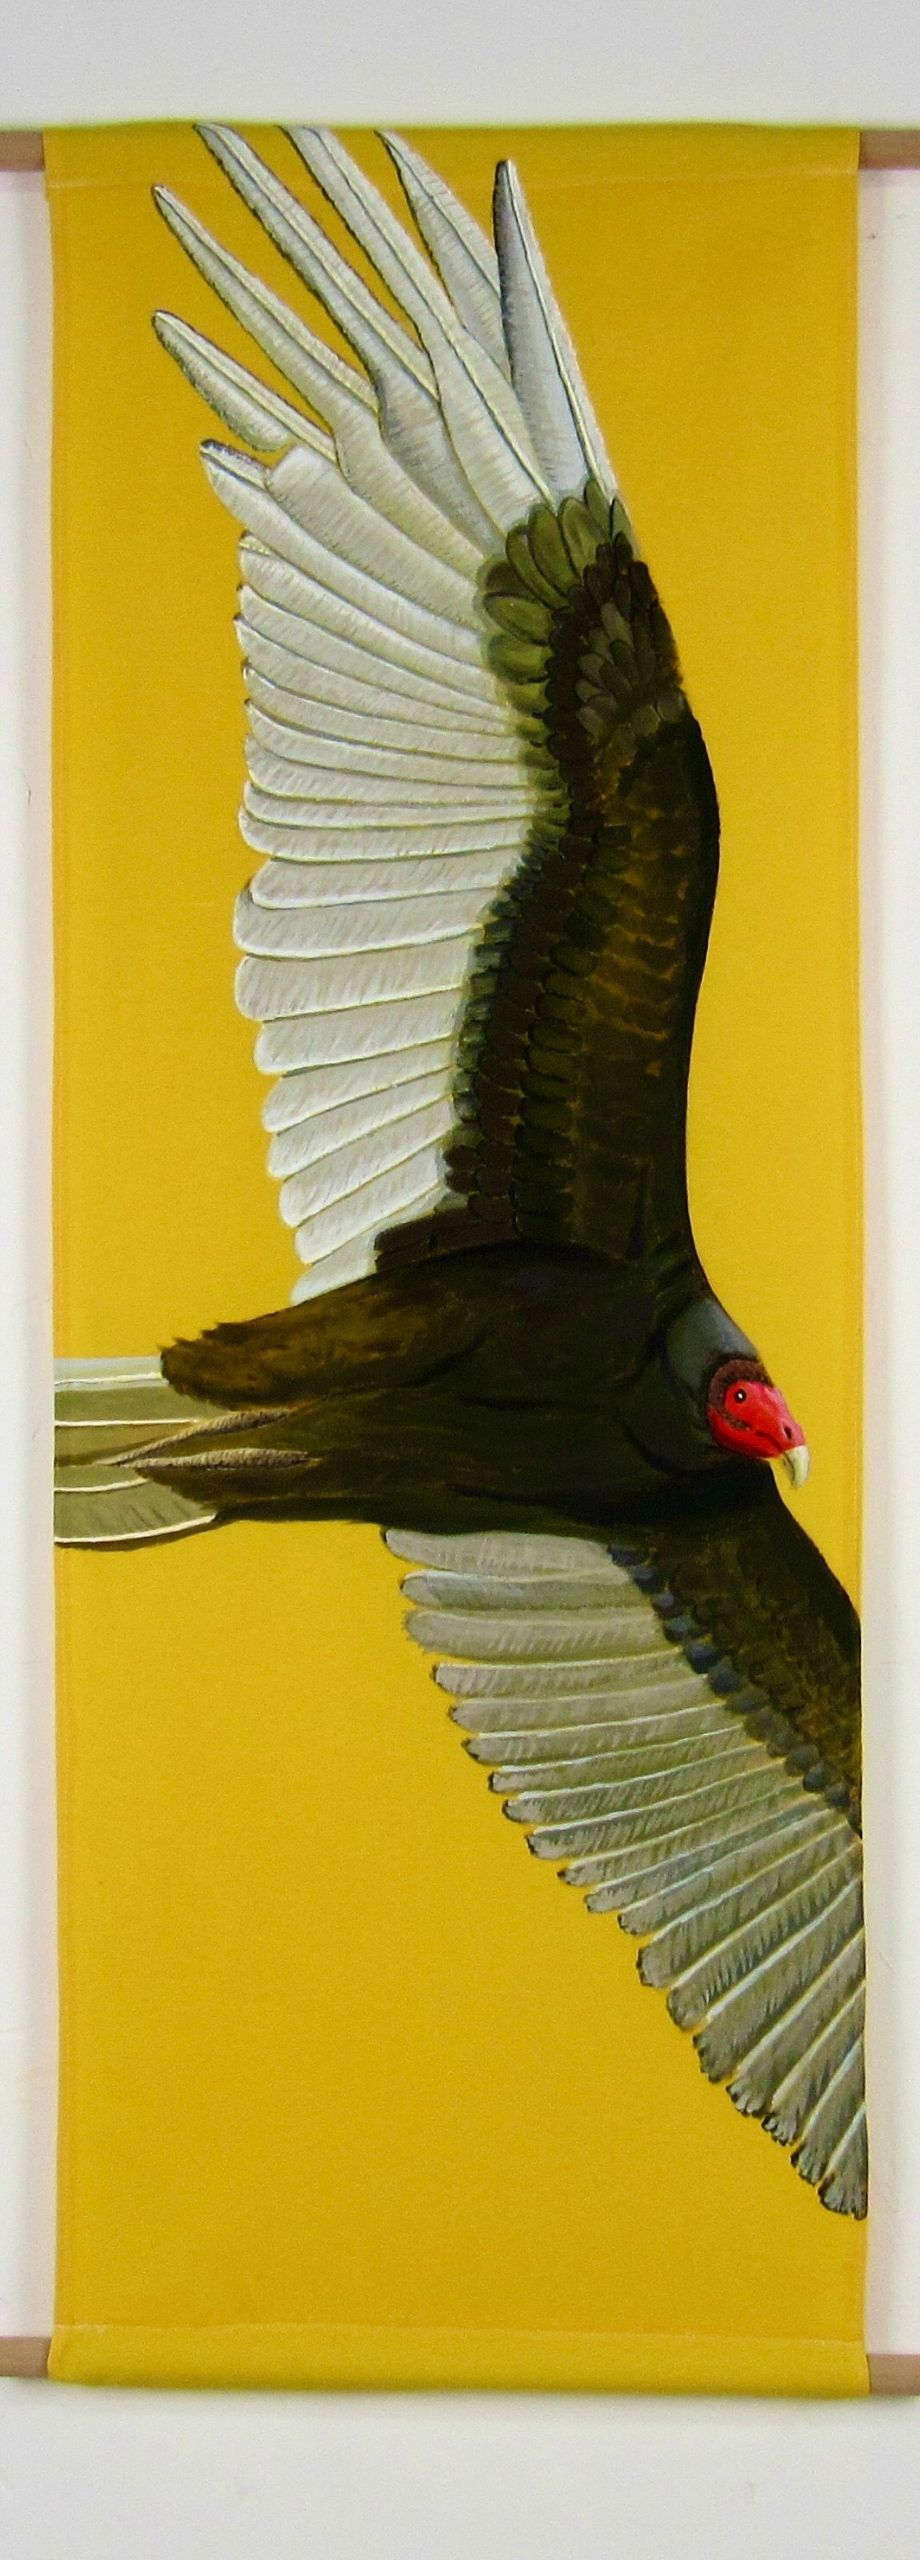 Red headed jote bird (135x45 cm)